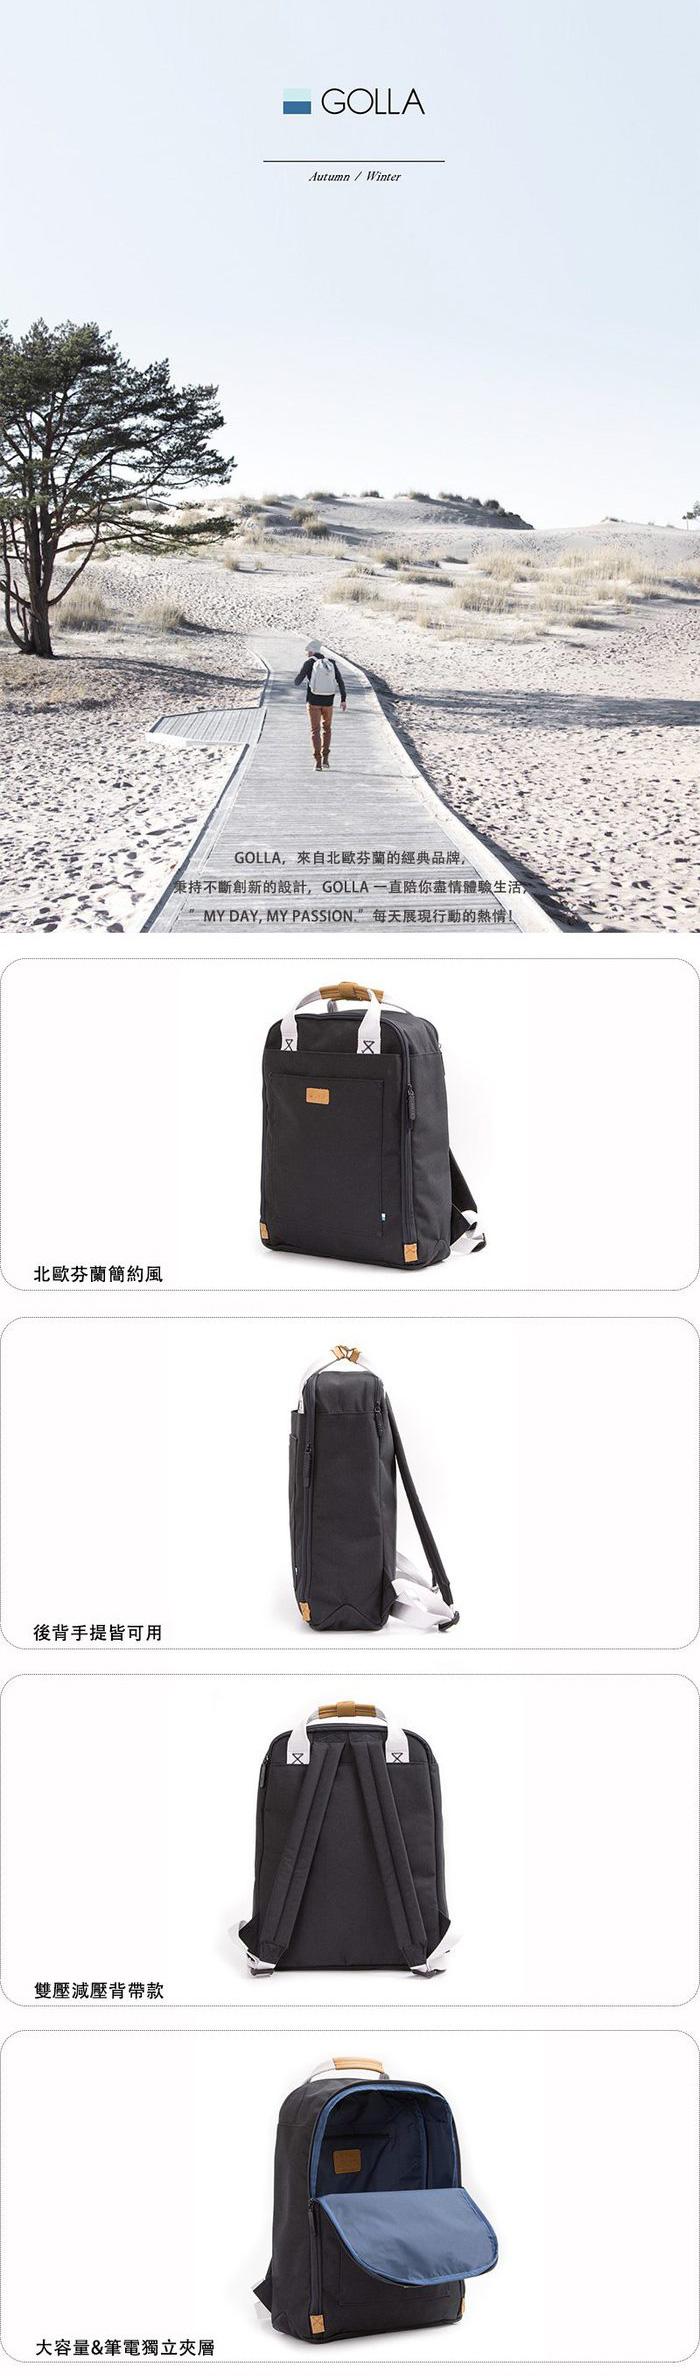 GOLLA | 北歐芬蘭時尚極簡後背包15.6吋 G1767-煤礦黑